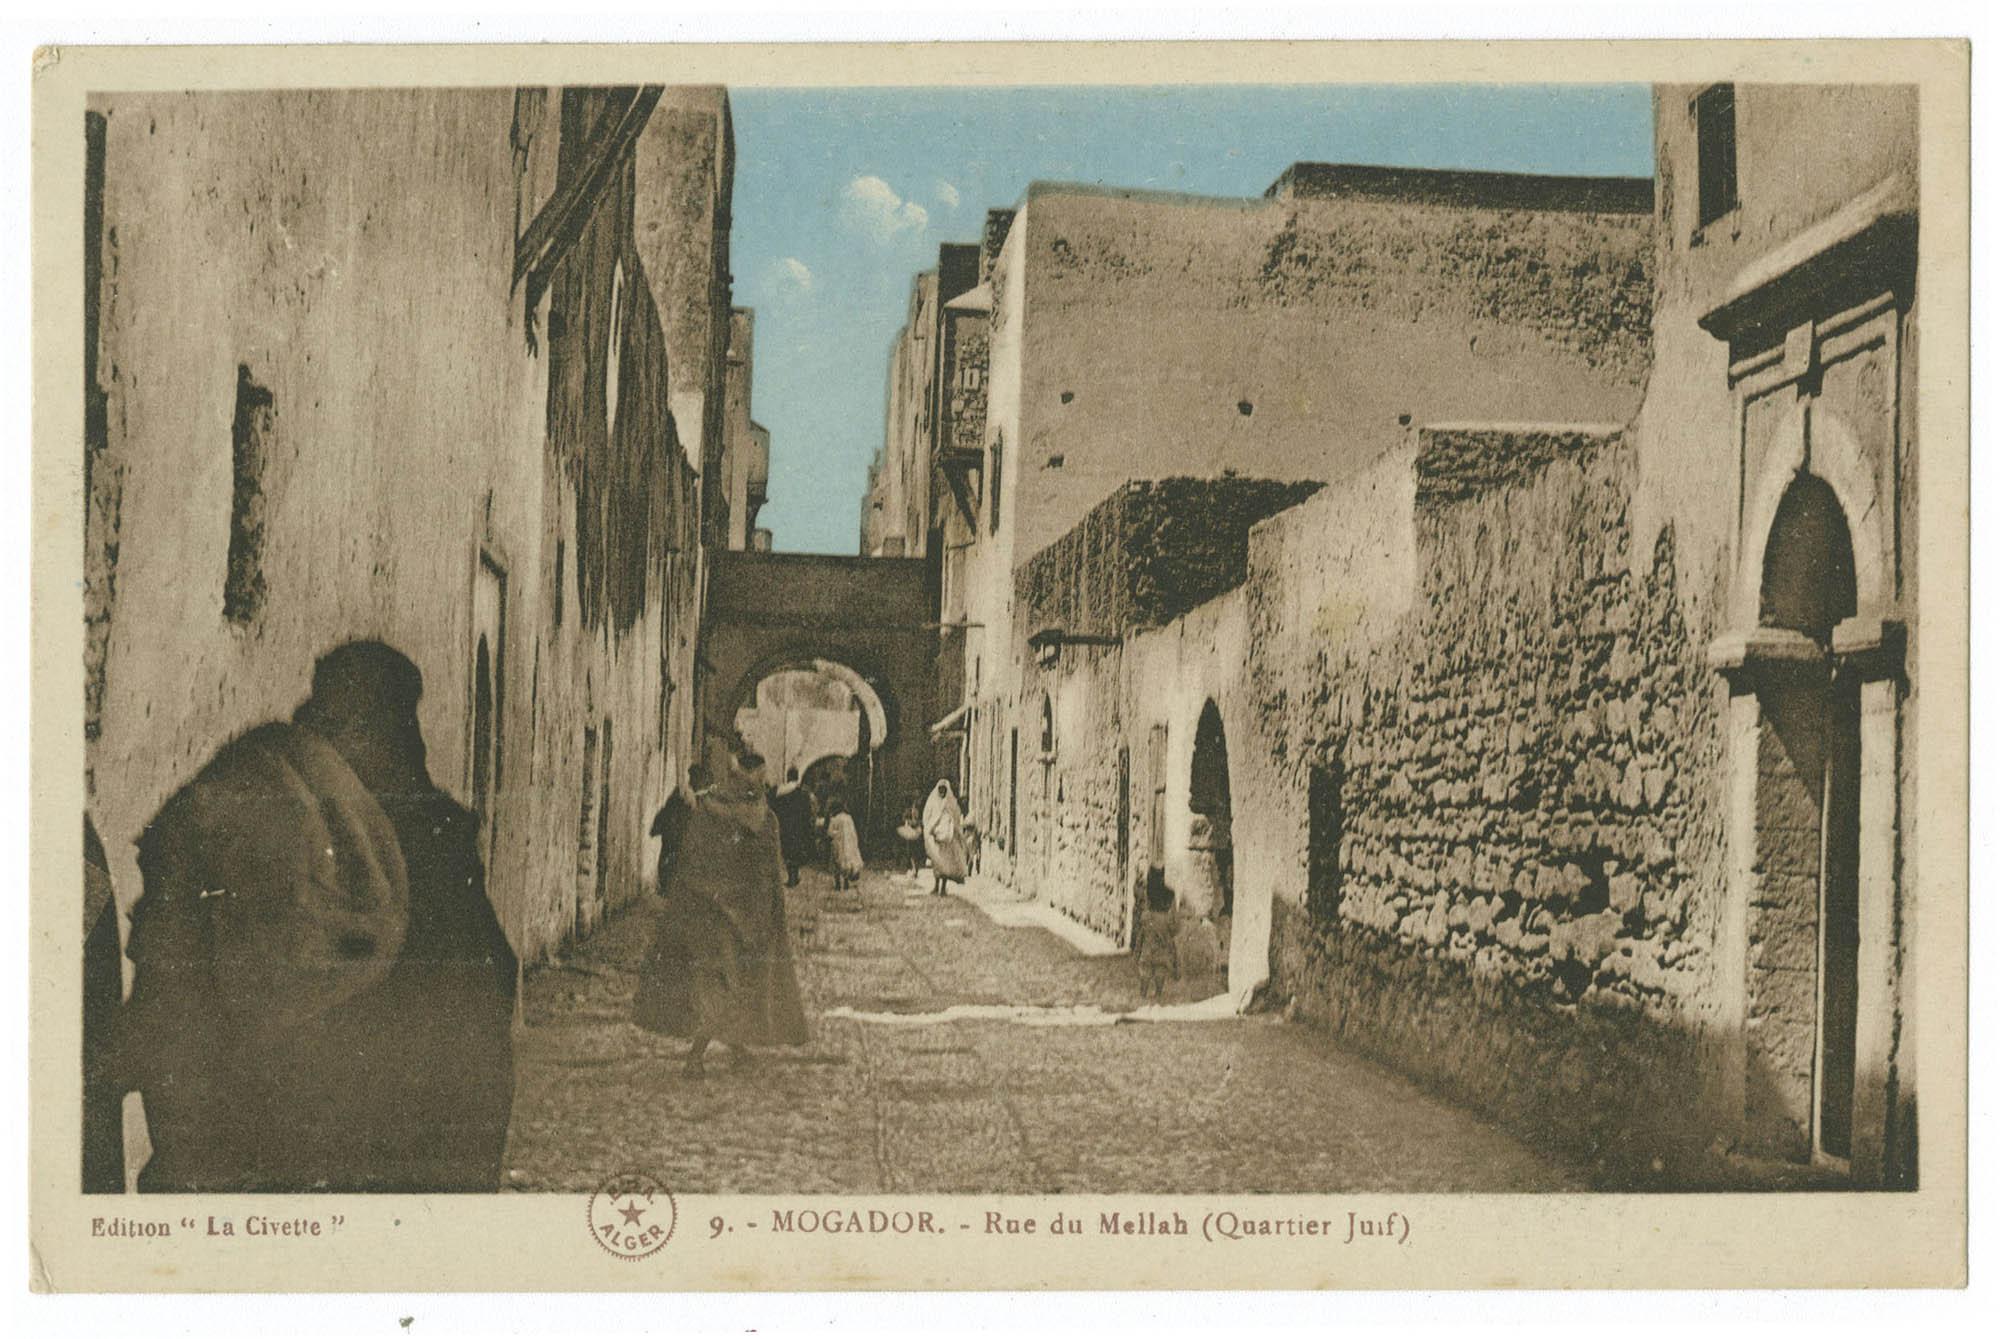 MOGADOR. - Rue du Mellah (Quartier Juif)